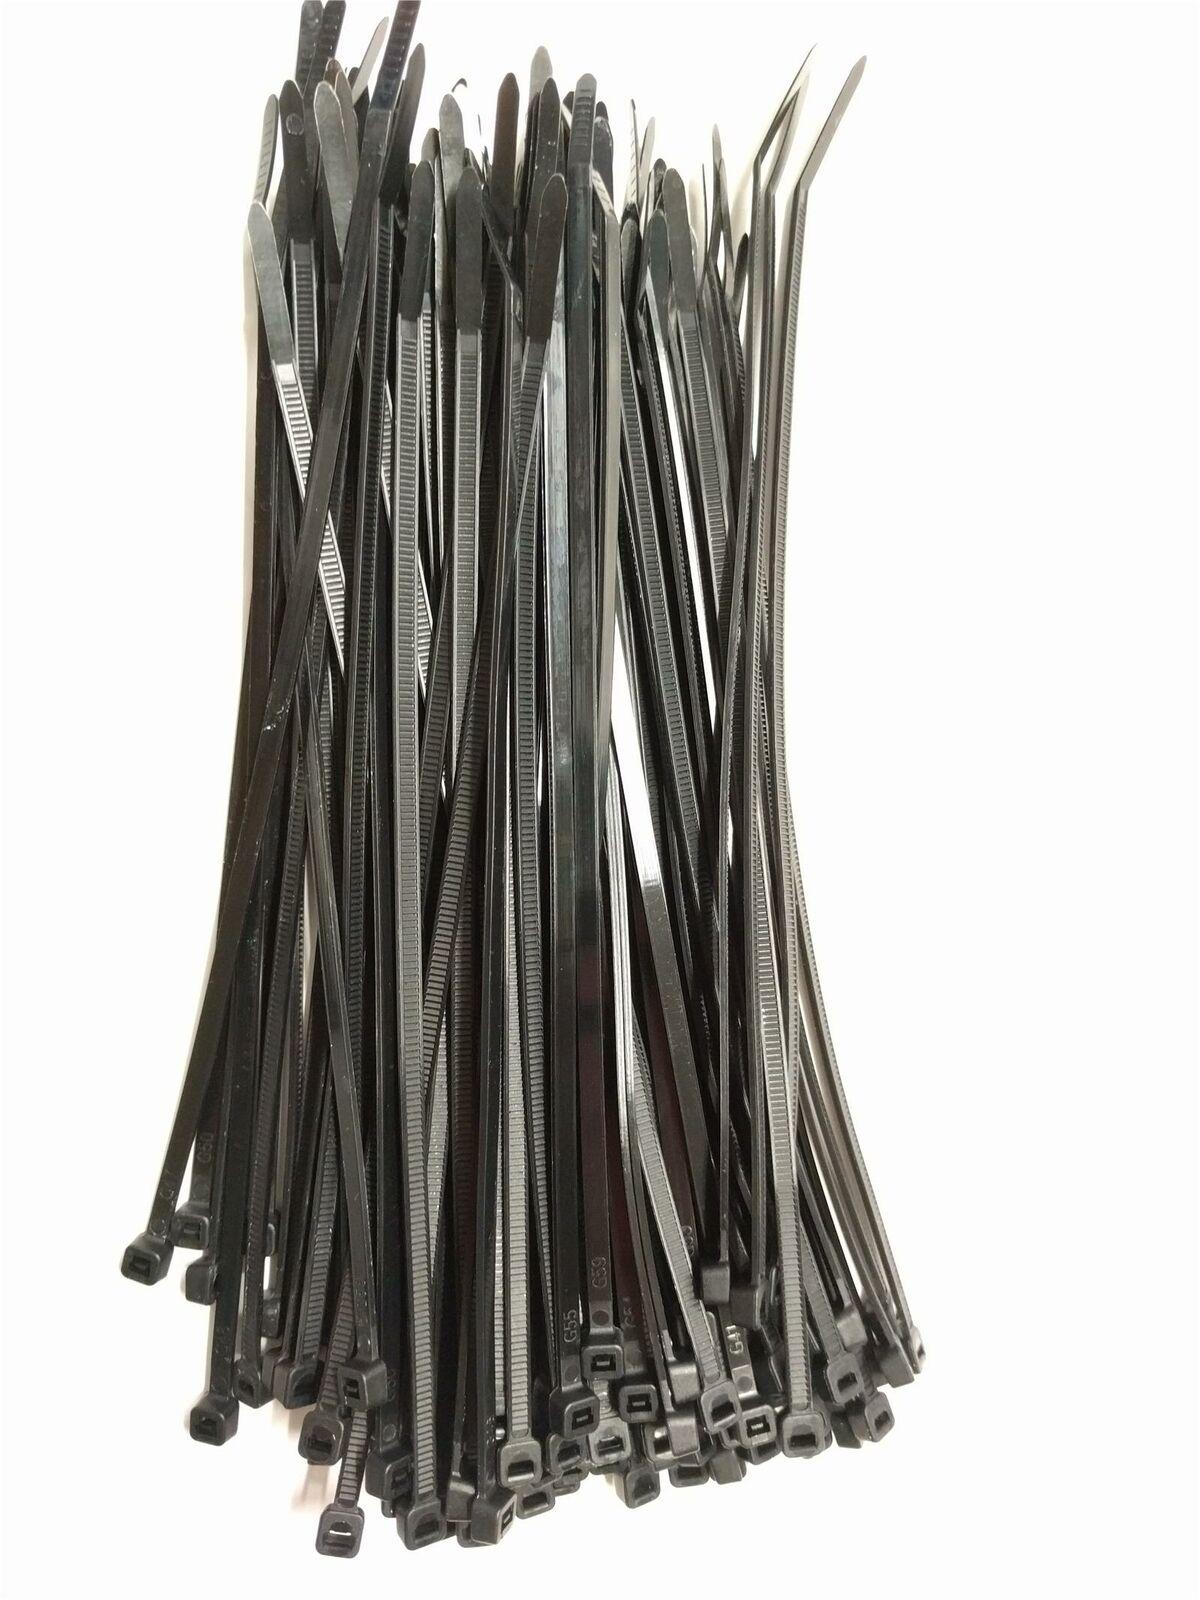 Strong Nylon Plastic 100 Black Cable Ties / Tie Wraps Zip Ties Size 200 x 3.6mm